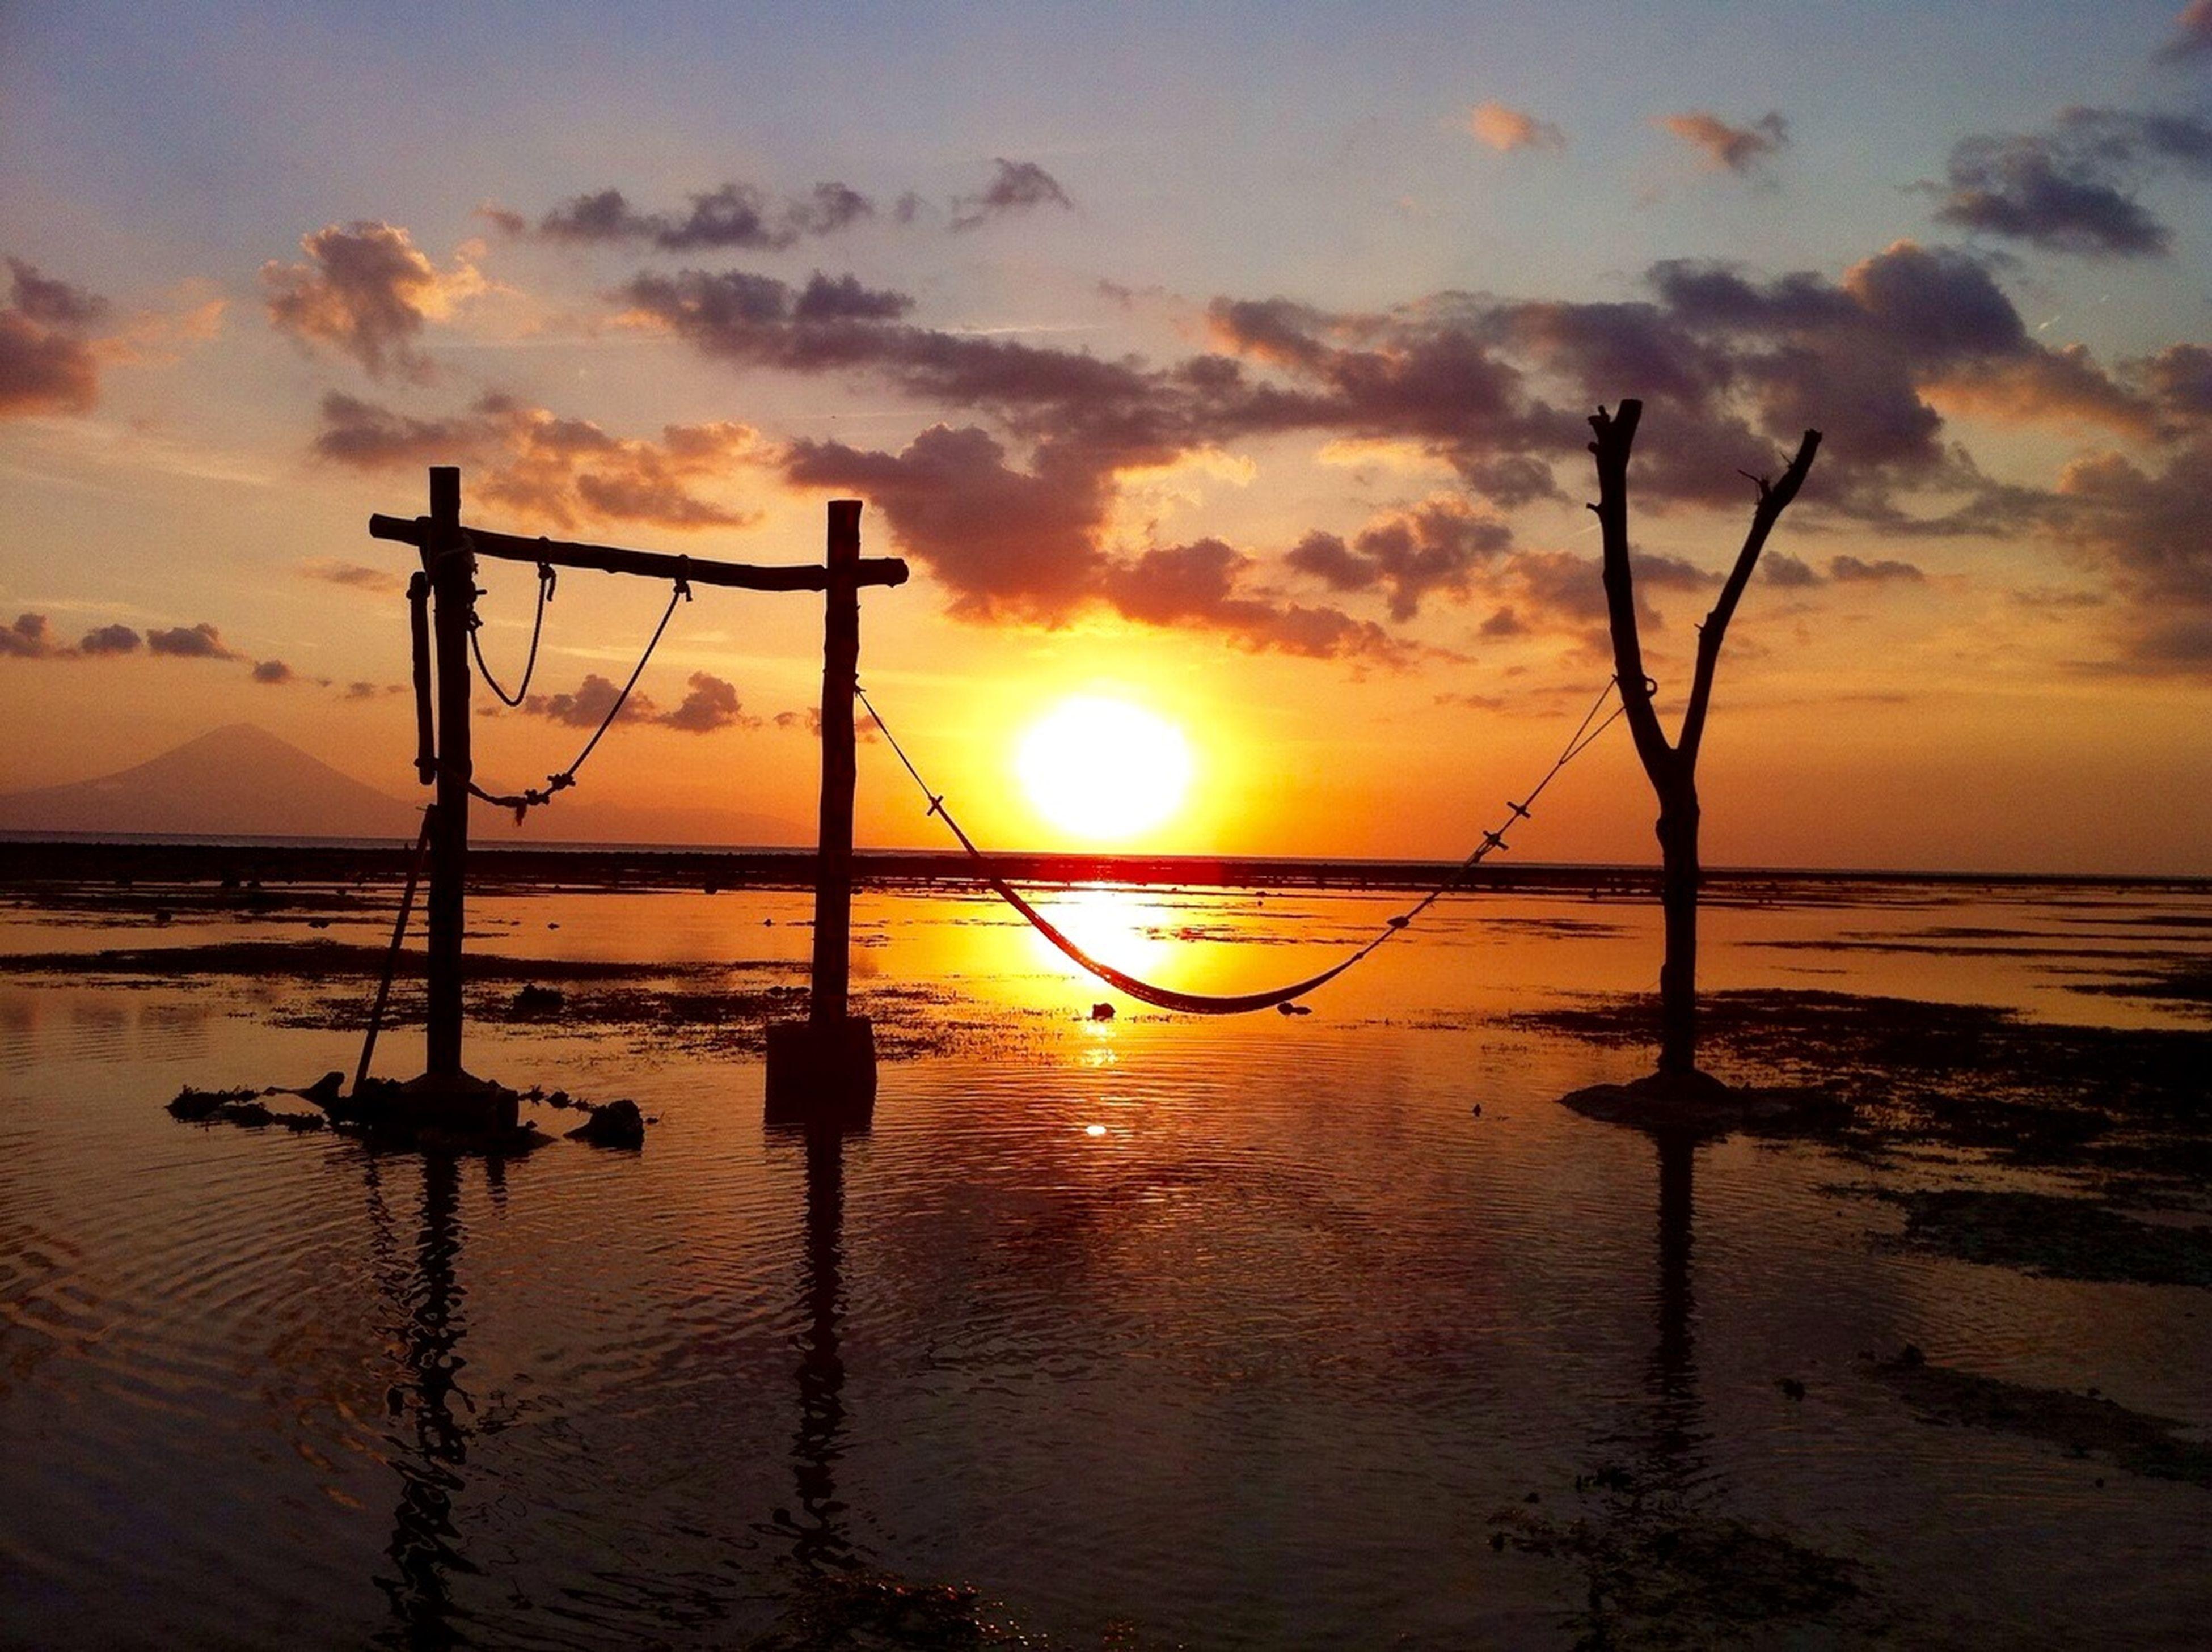 Bali Sunrise_sunsets_aroundworld Traveling Beautiful Landscape Sky Collection Reflection